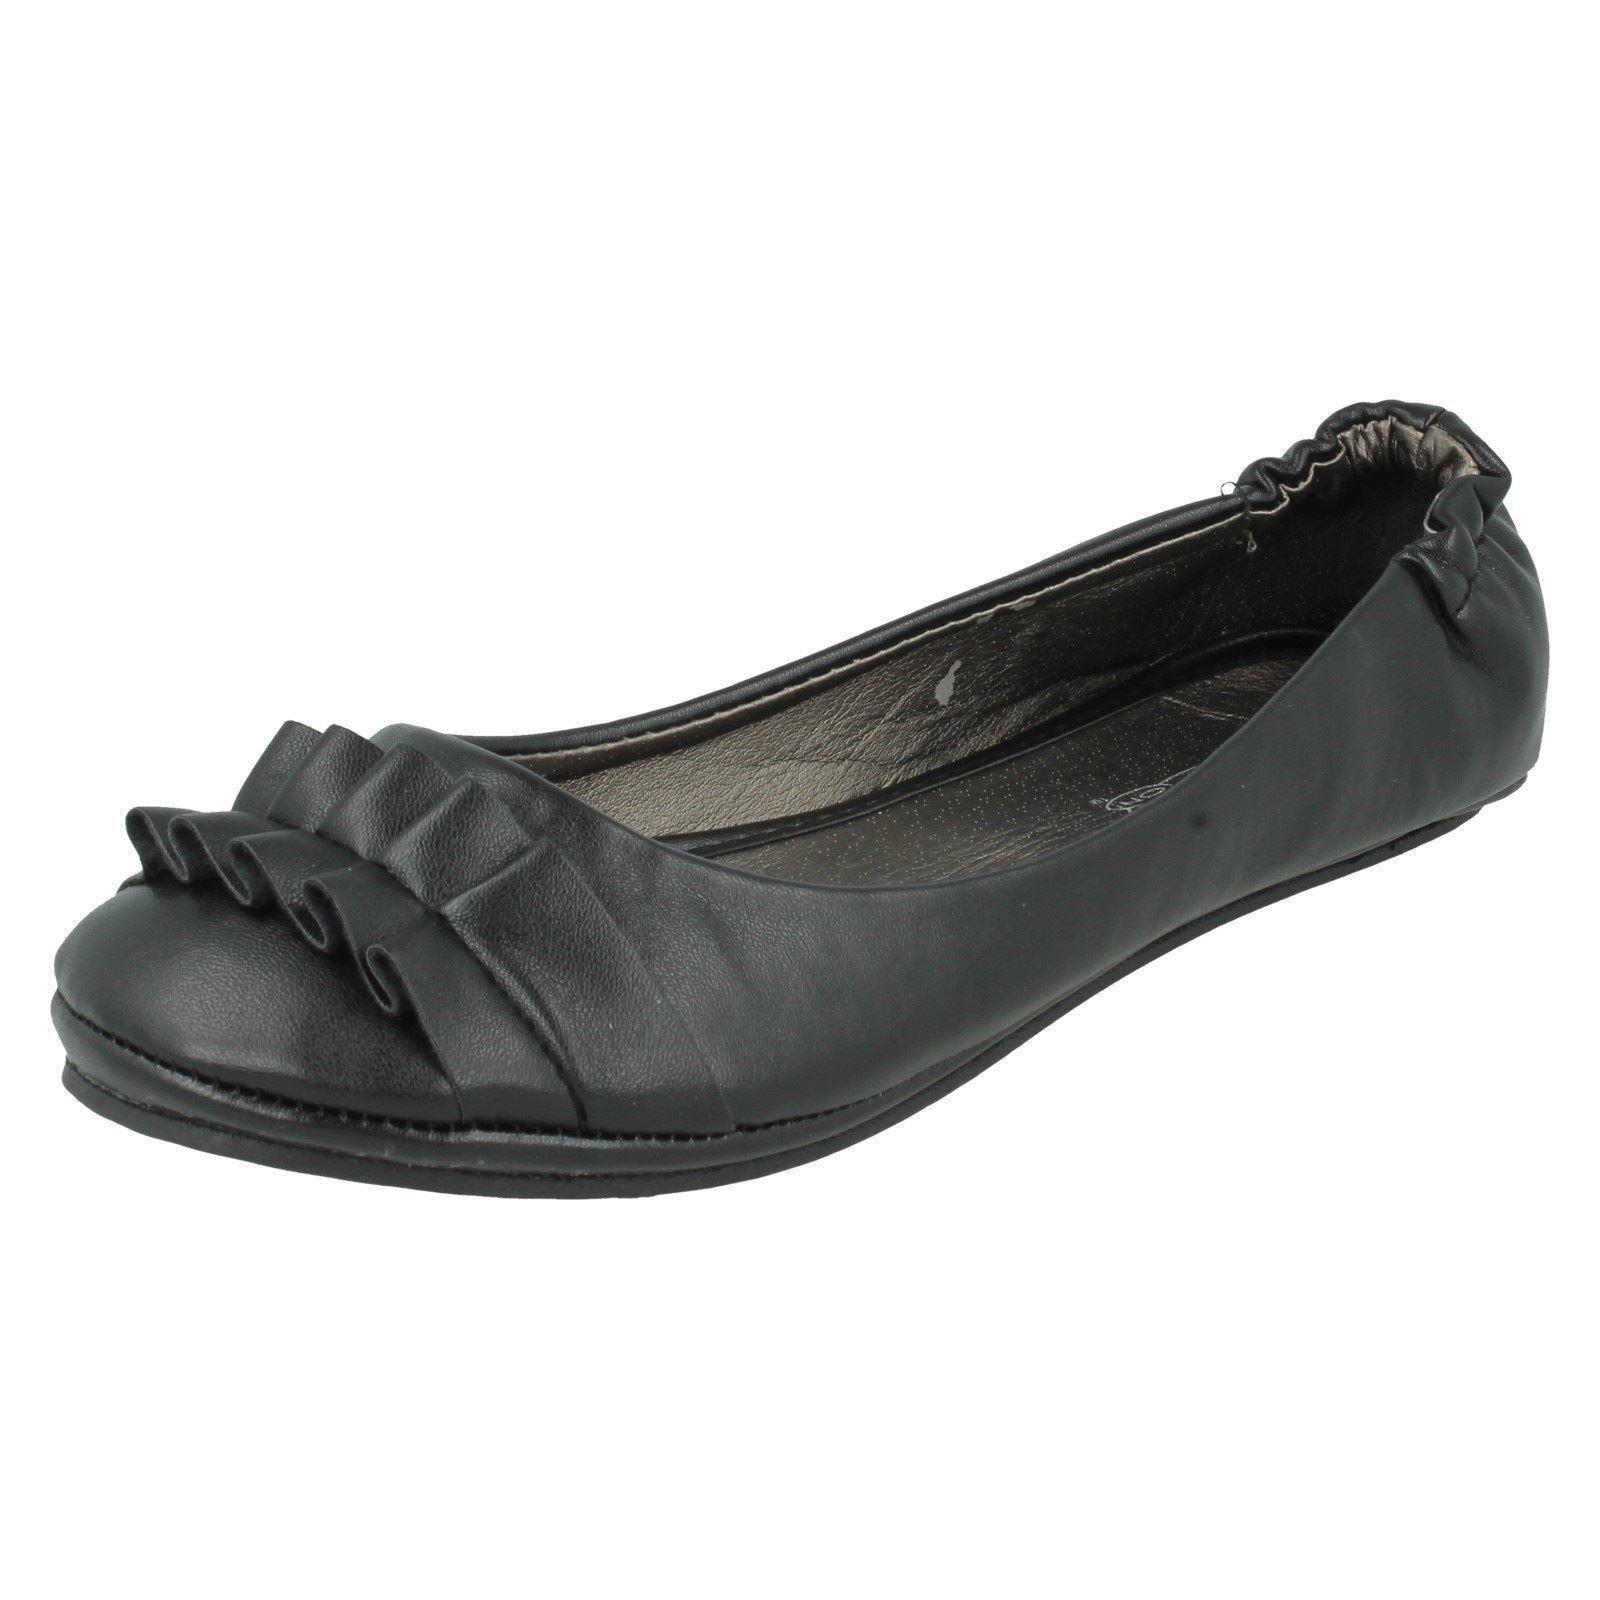 Damas Spot On Puntera Redonda Zapatos Bailarina Plana ruschen detalle el estilo-F8539